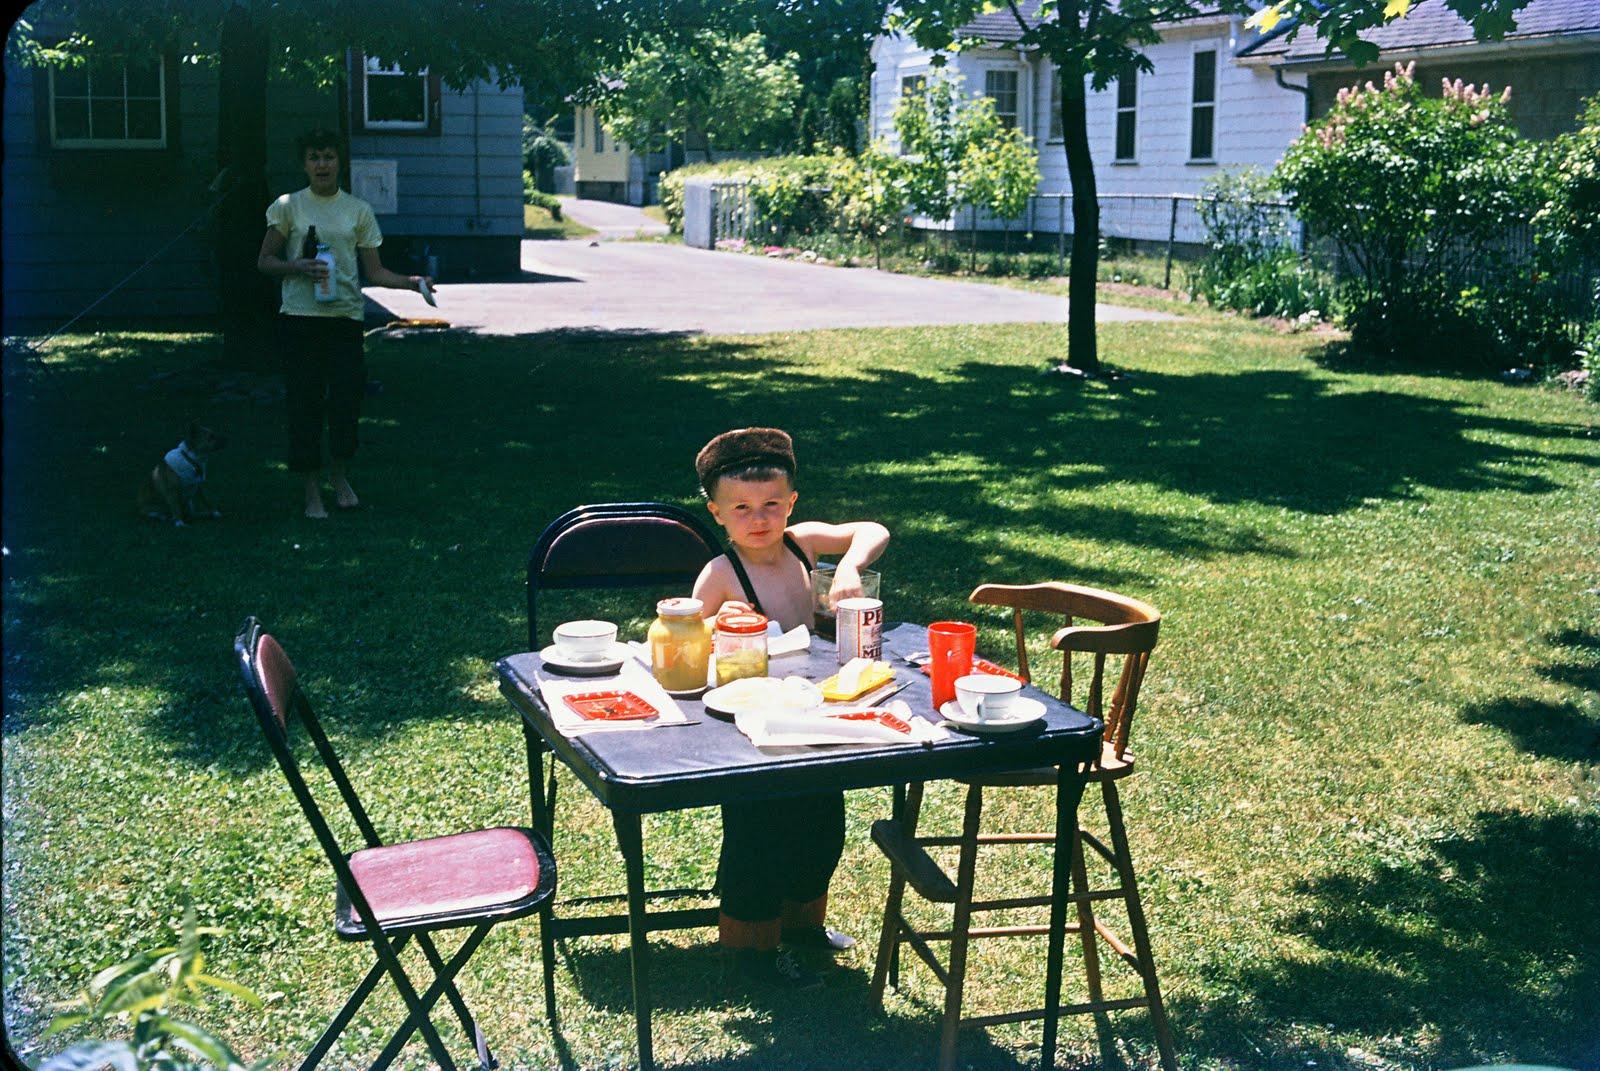 http://3.bp.blogspot.com/-k9m0a6k3pWI/Tcno8HwAb6I/AAAAAAAAD0M/VxmCQtcg4Gk/s1600/Backyard+Picnic.jpg